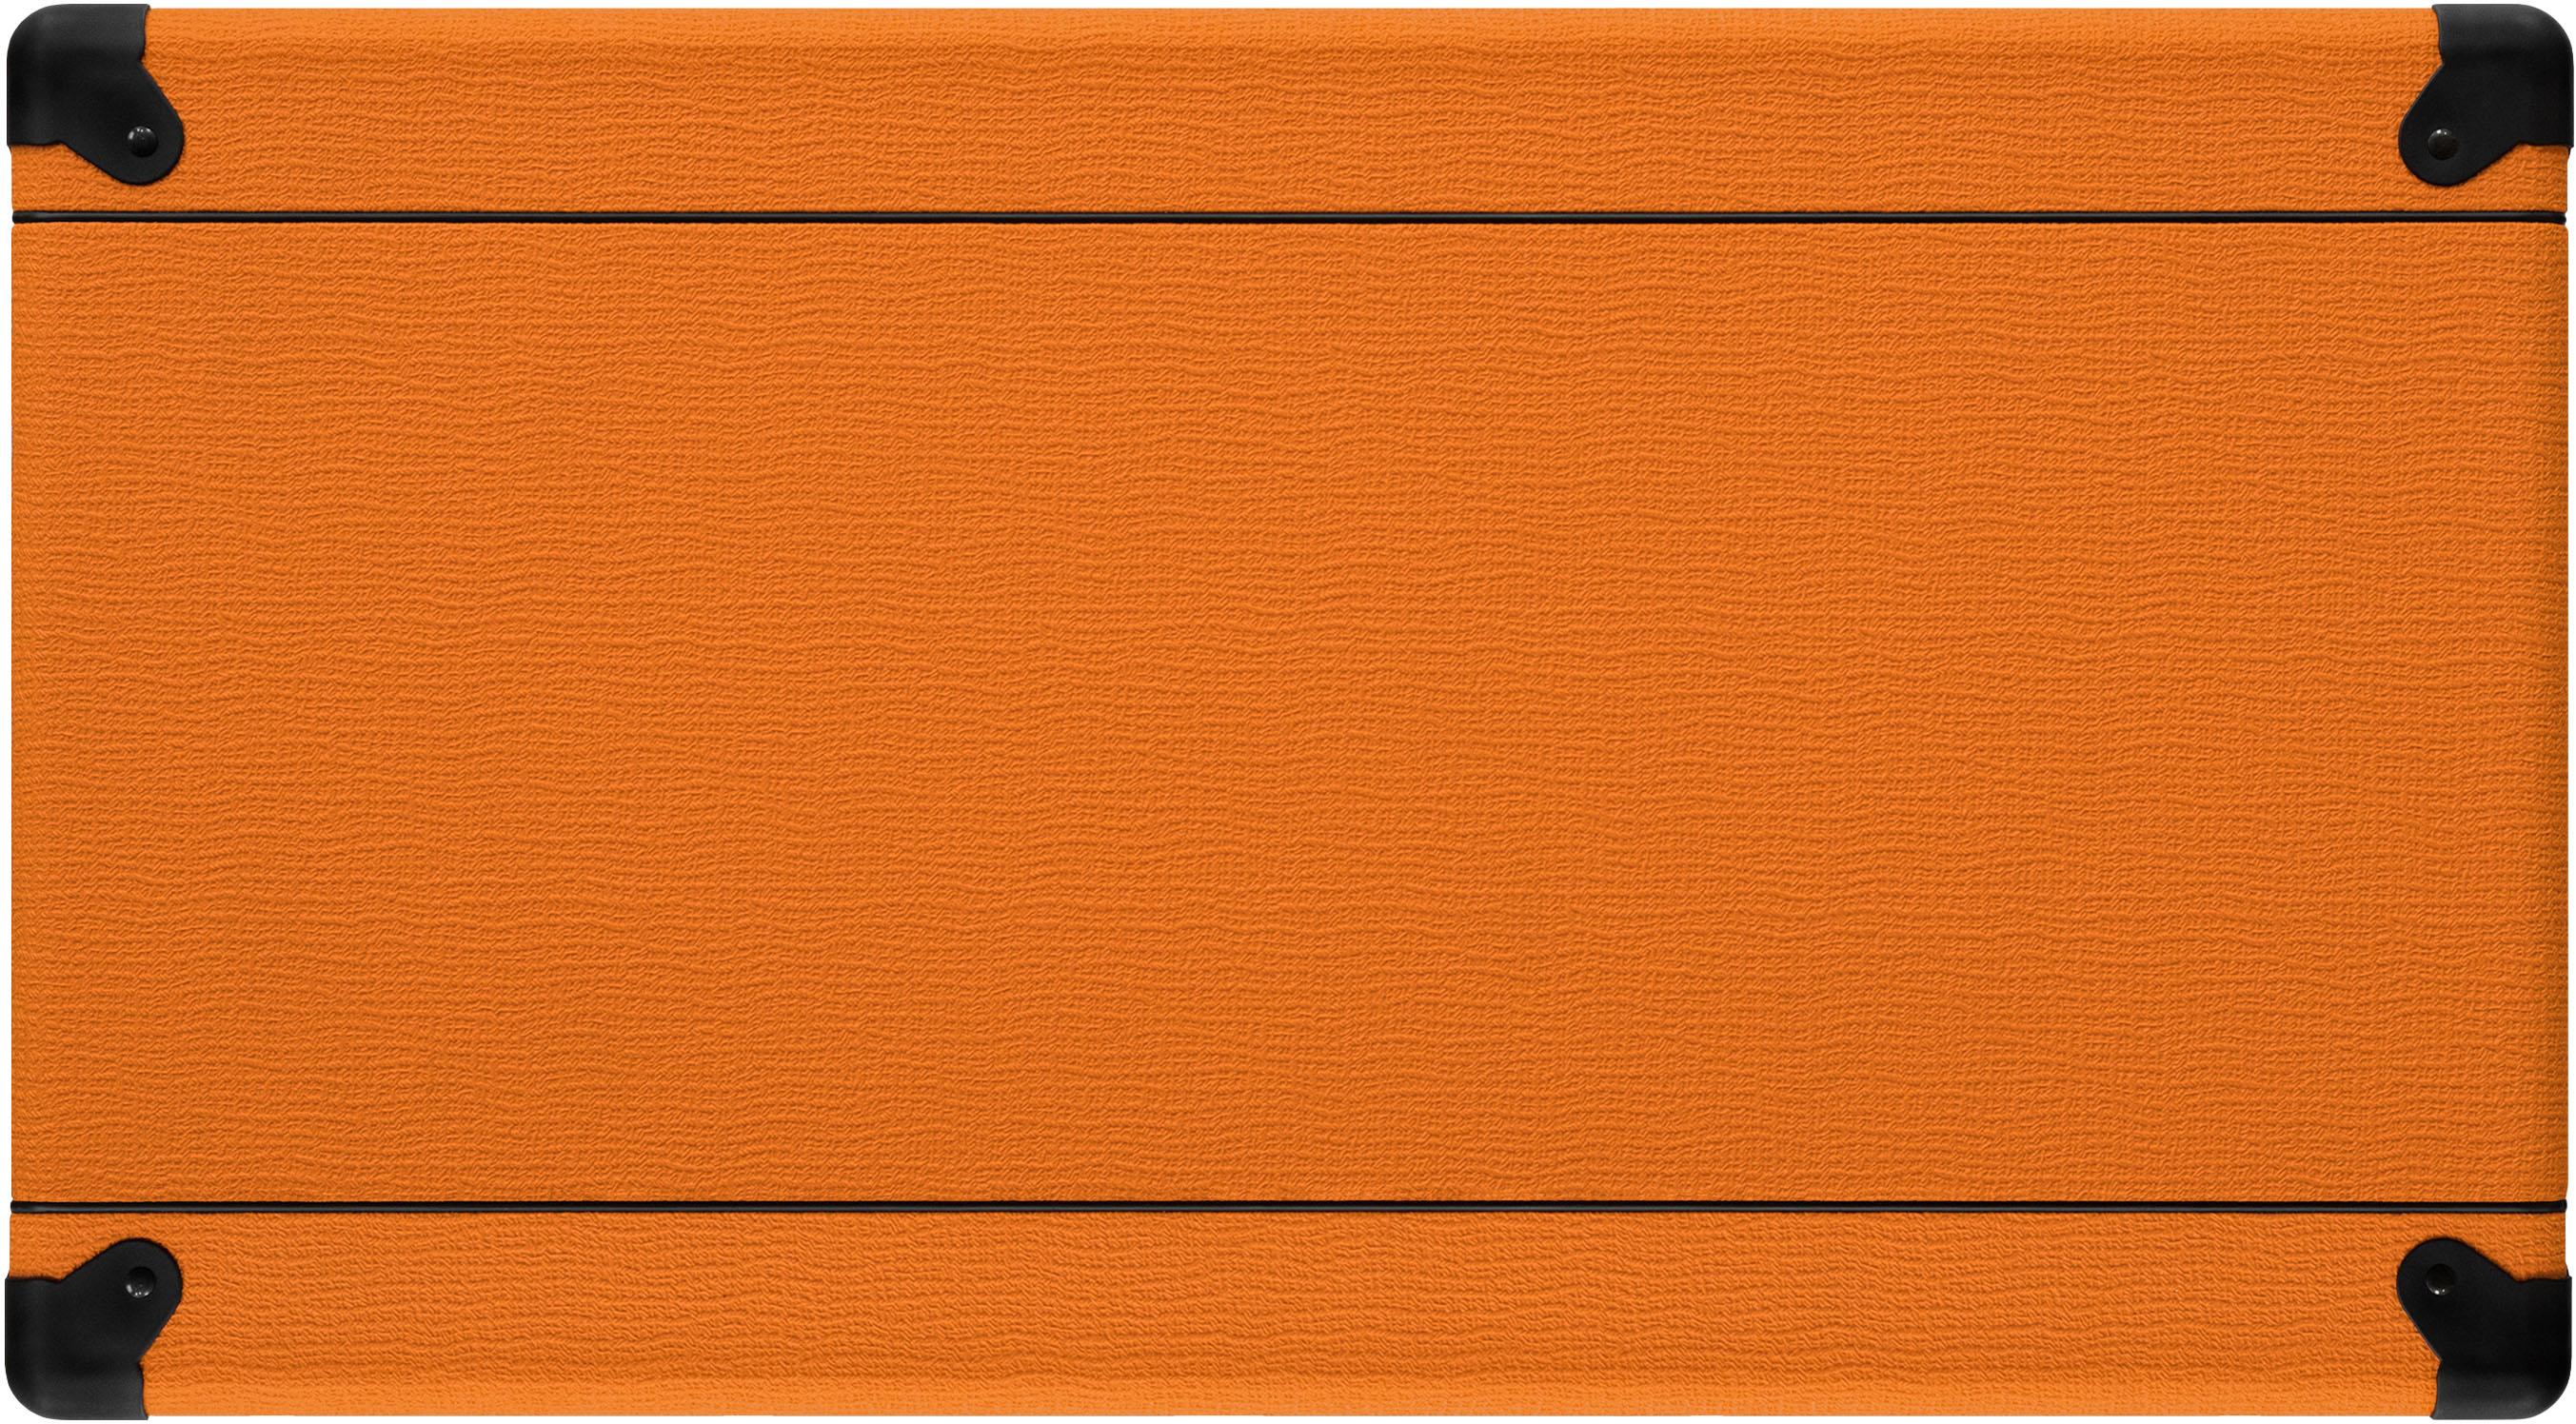 Orange-PPC212V-2x12-Inch-Vertical-Guitar-Amplifier-Cabinet thumbnail 7